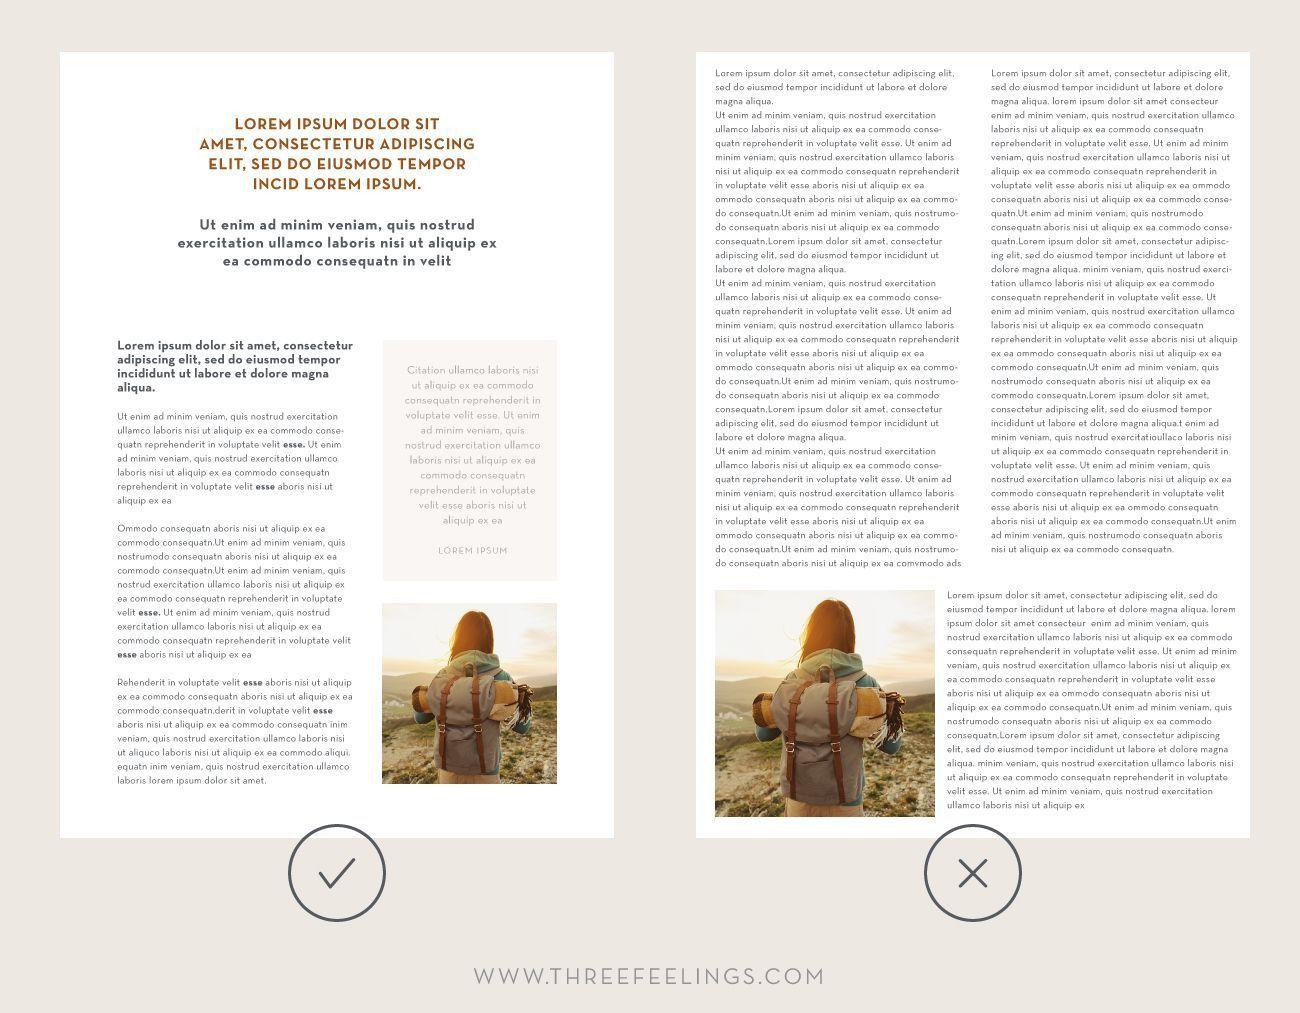 disenar-interior-infoproducto-composicion-profesional-threefeelings-03